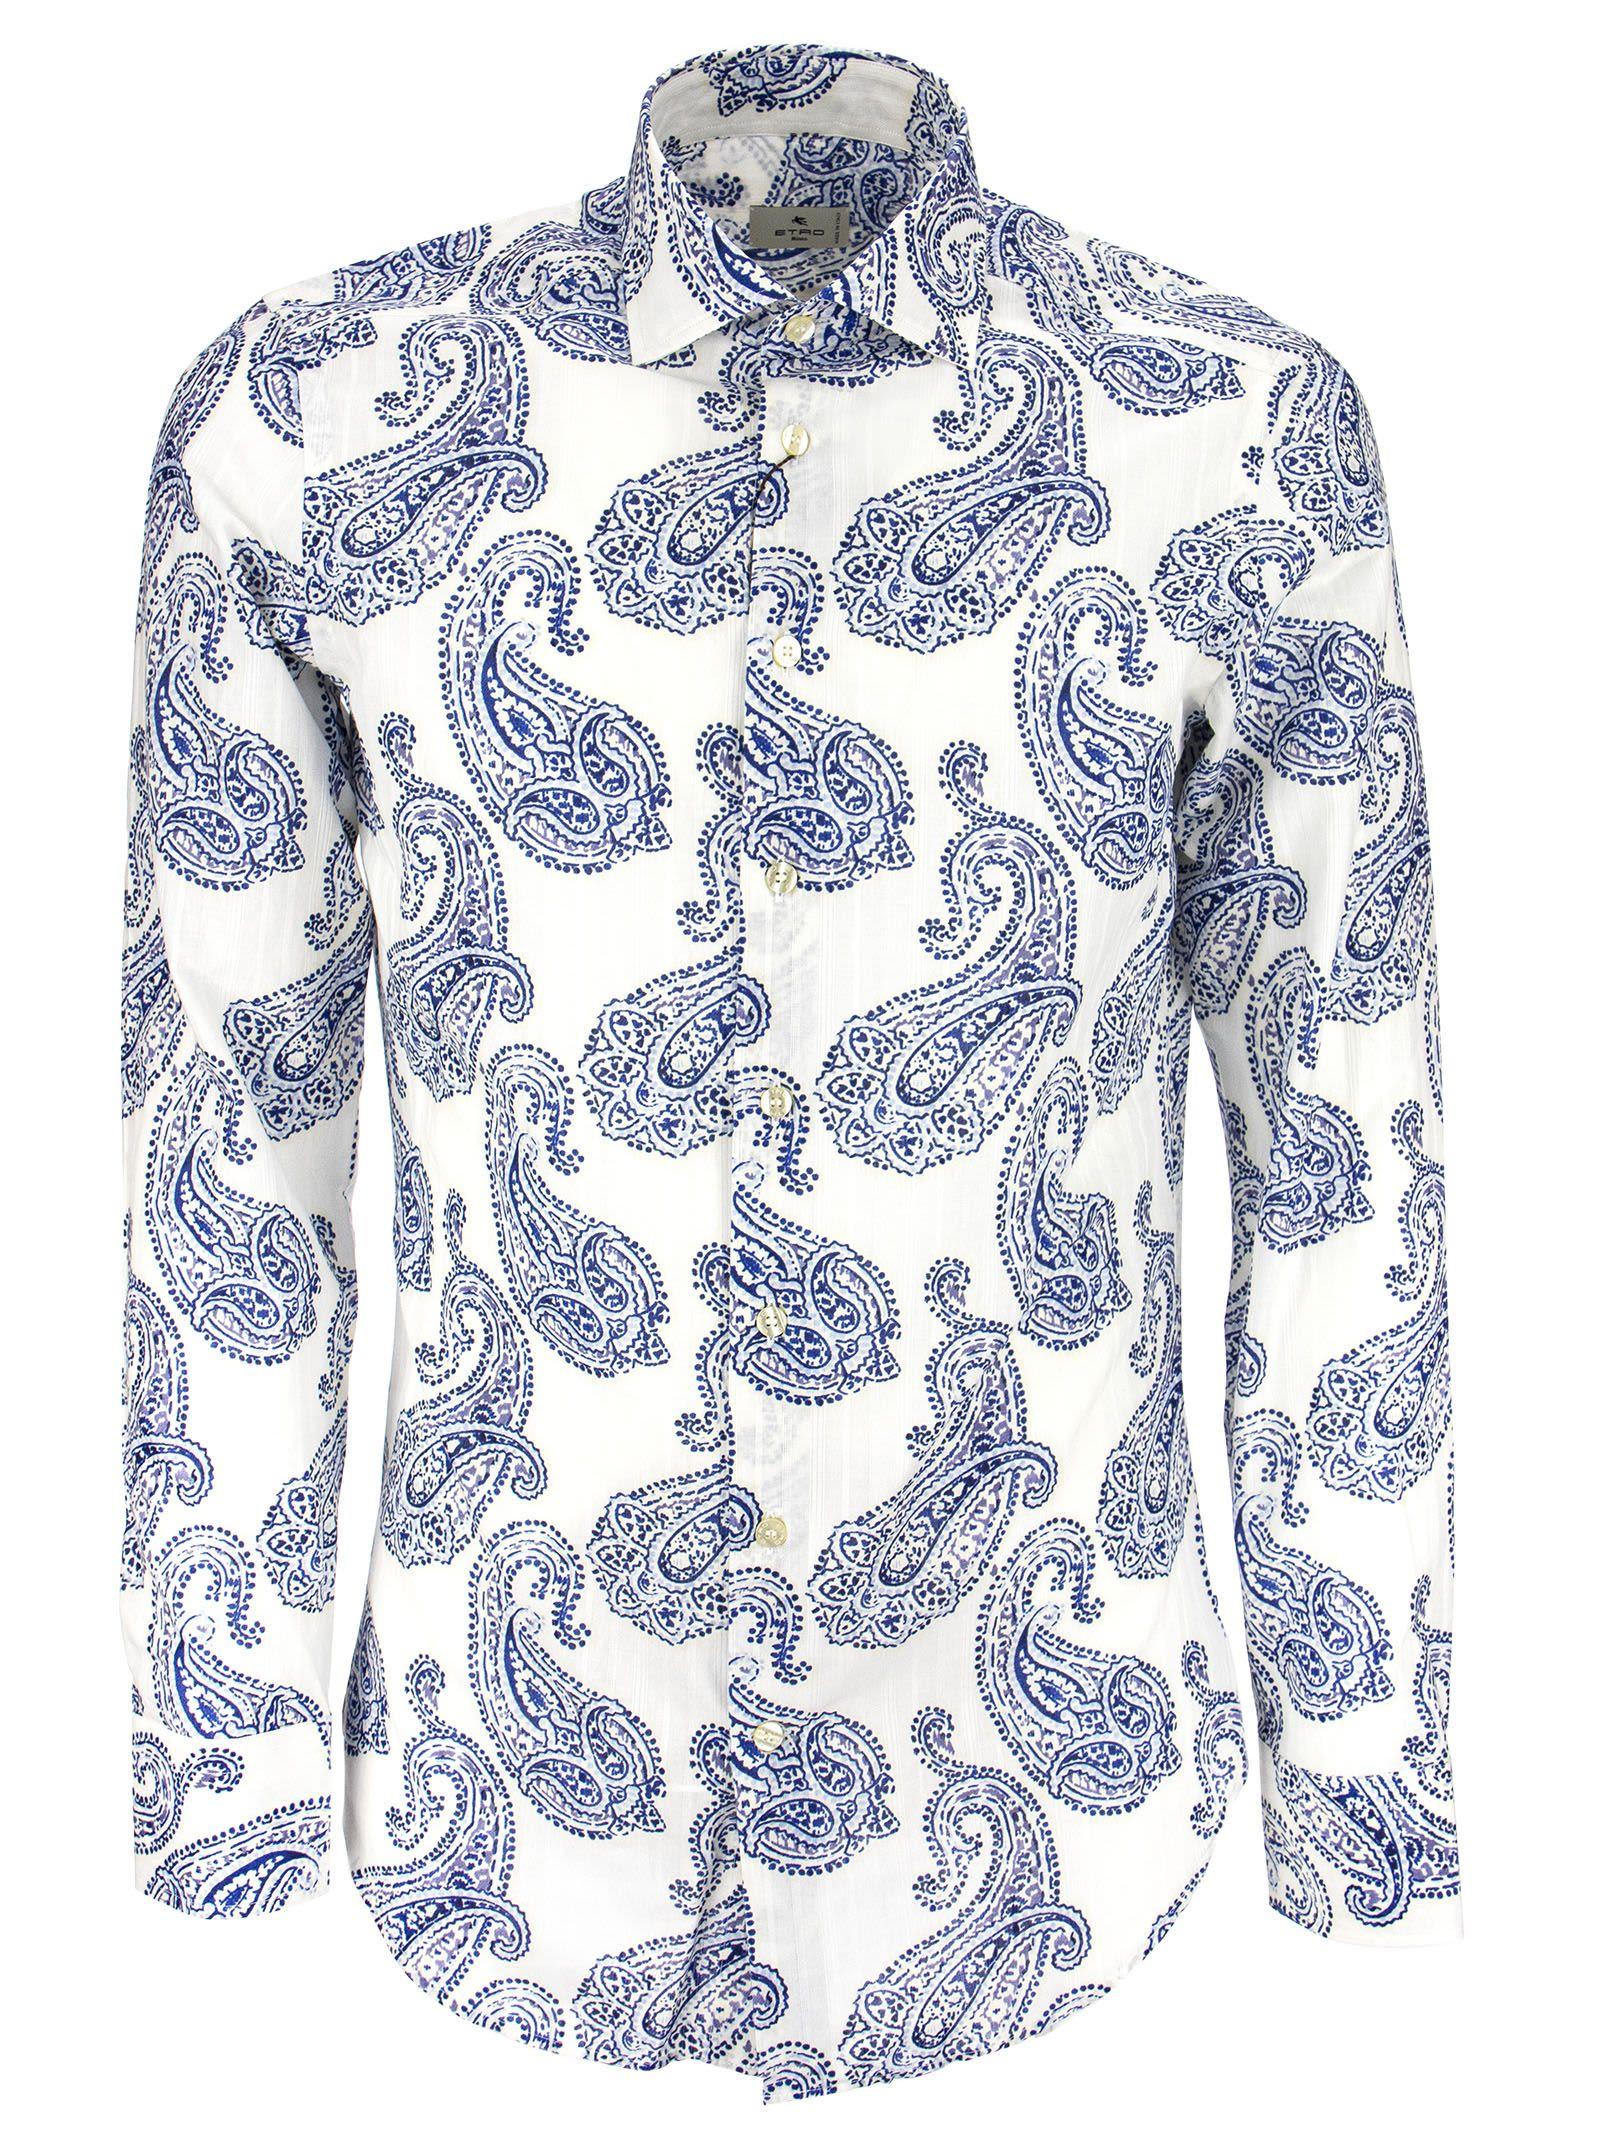 Etro Cottons JACQUARD SHIRT WITH PAISLEY MOTIFS